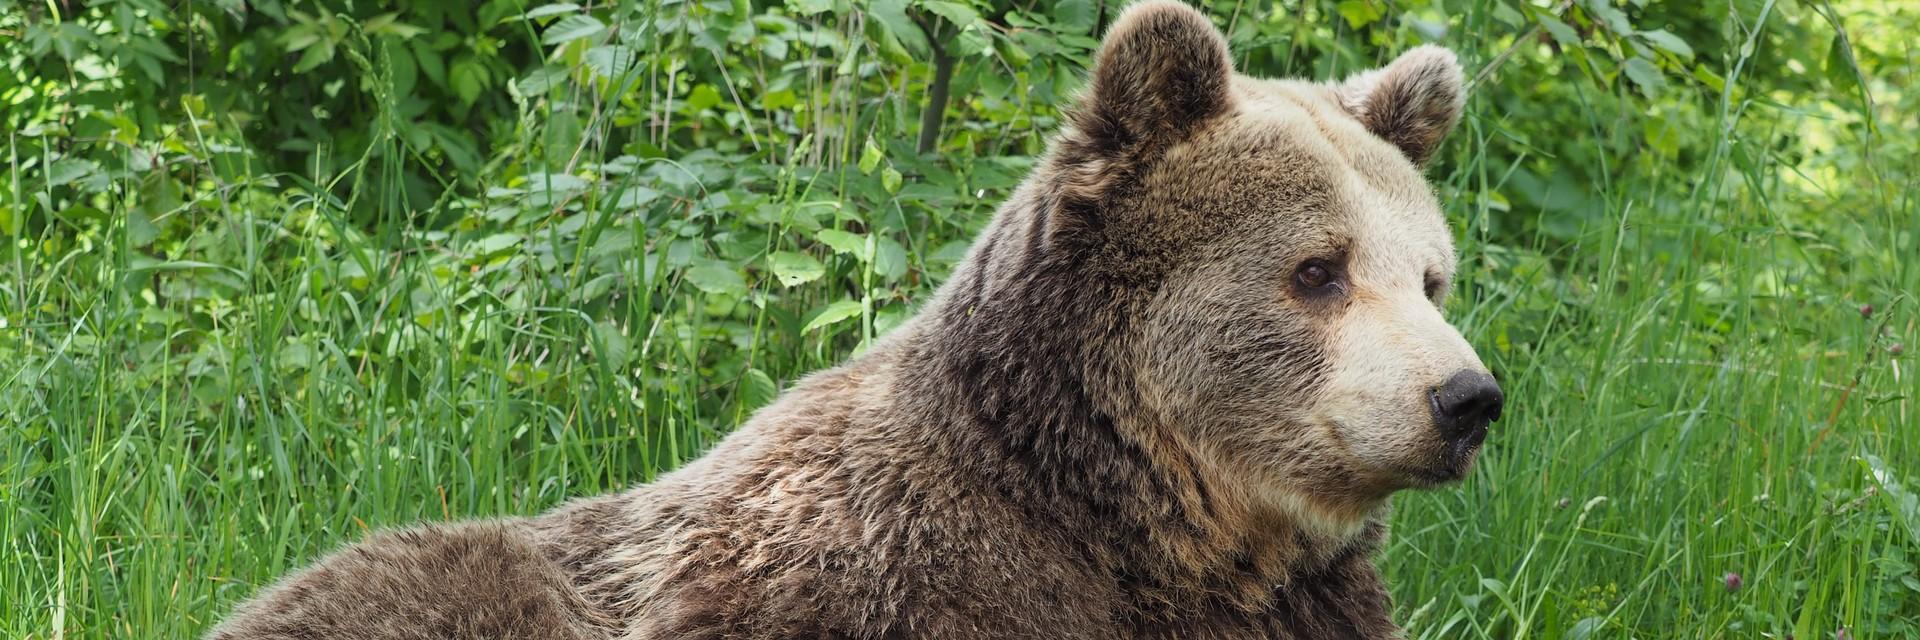 bear Brumca relaxing in the grass